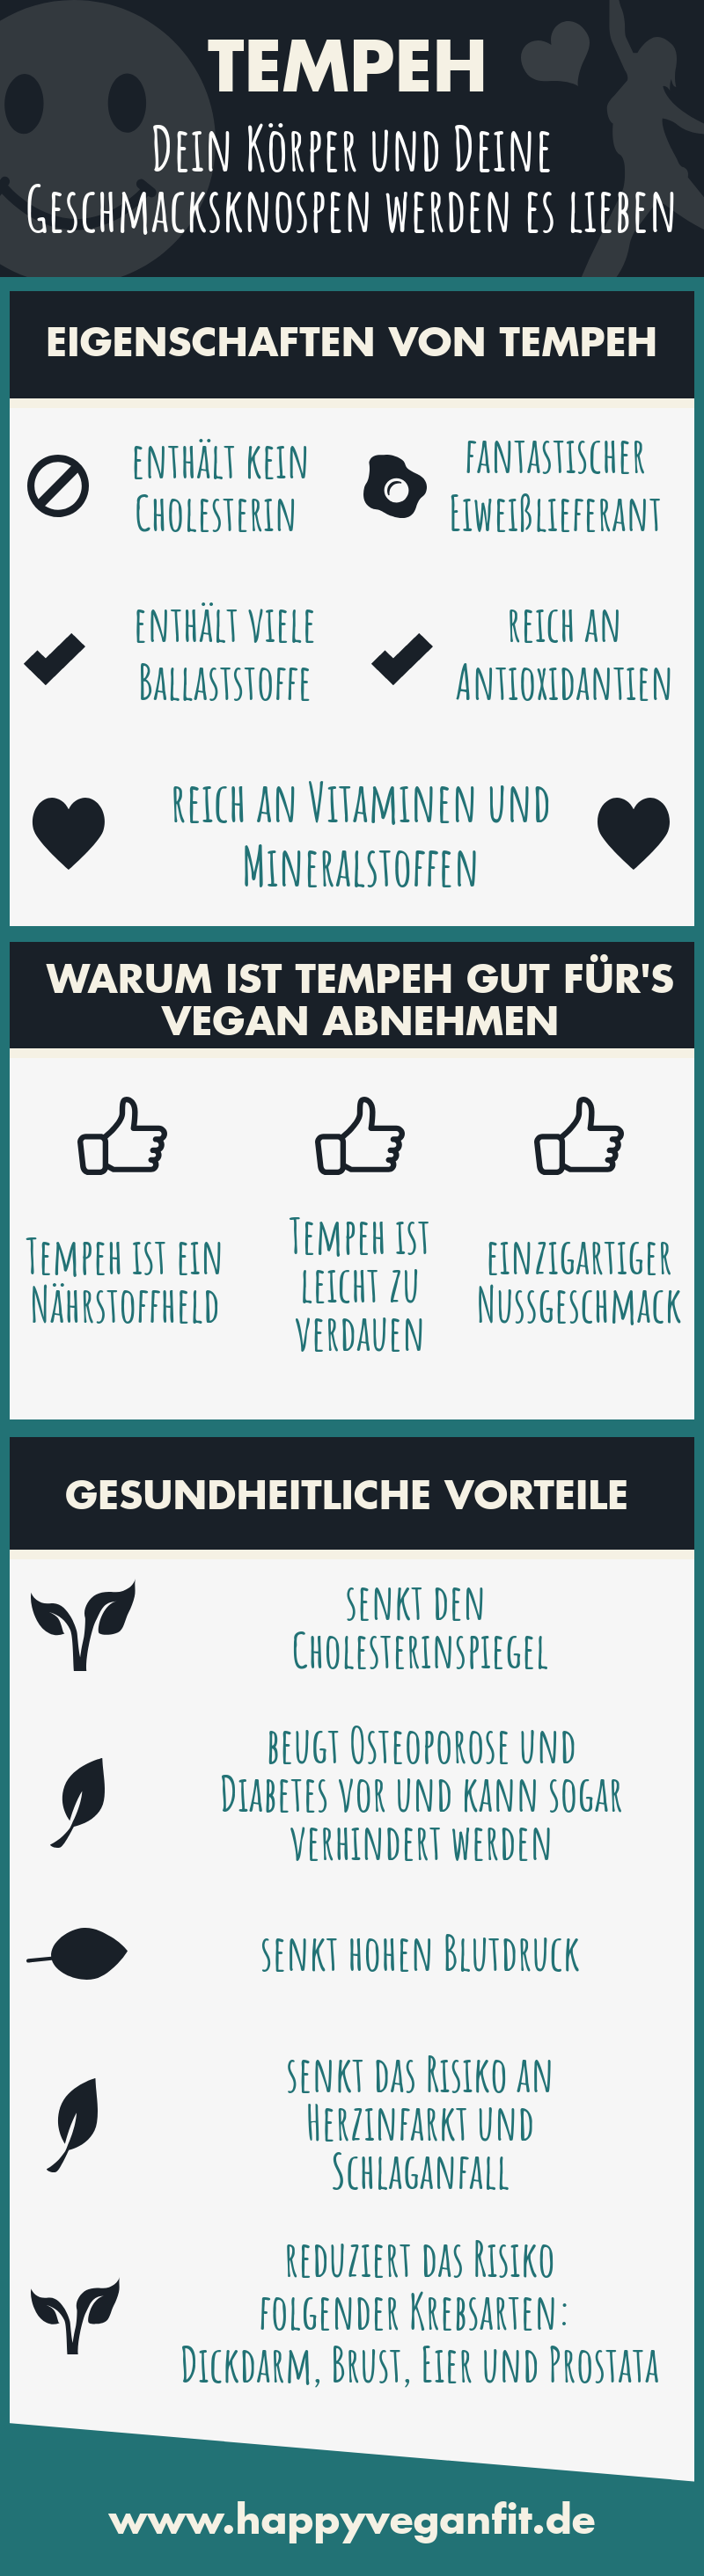 Vegan abnehmen was essen tempeh infografik